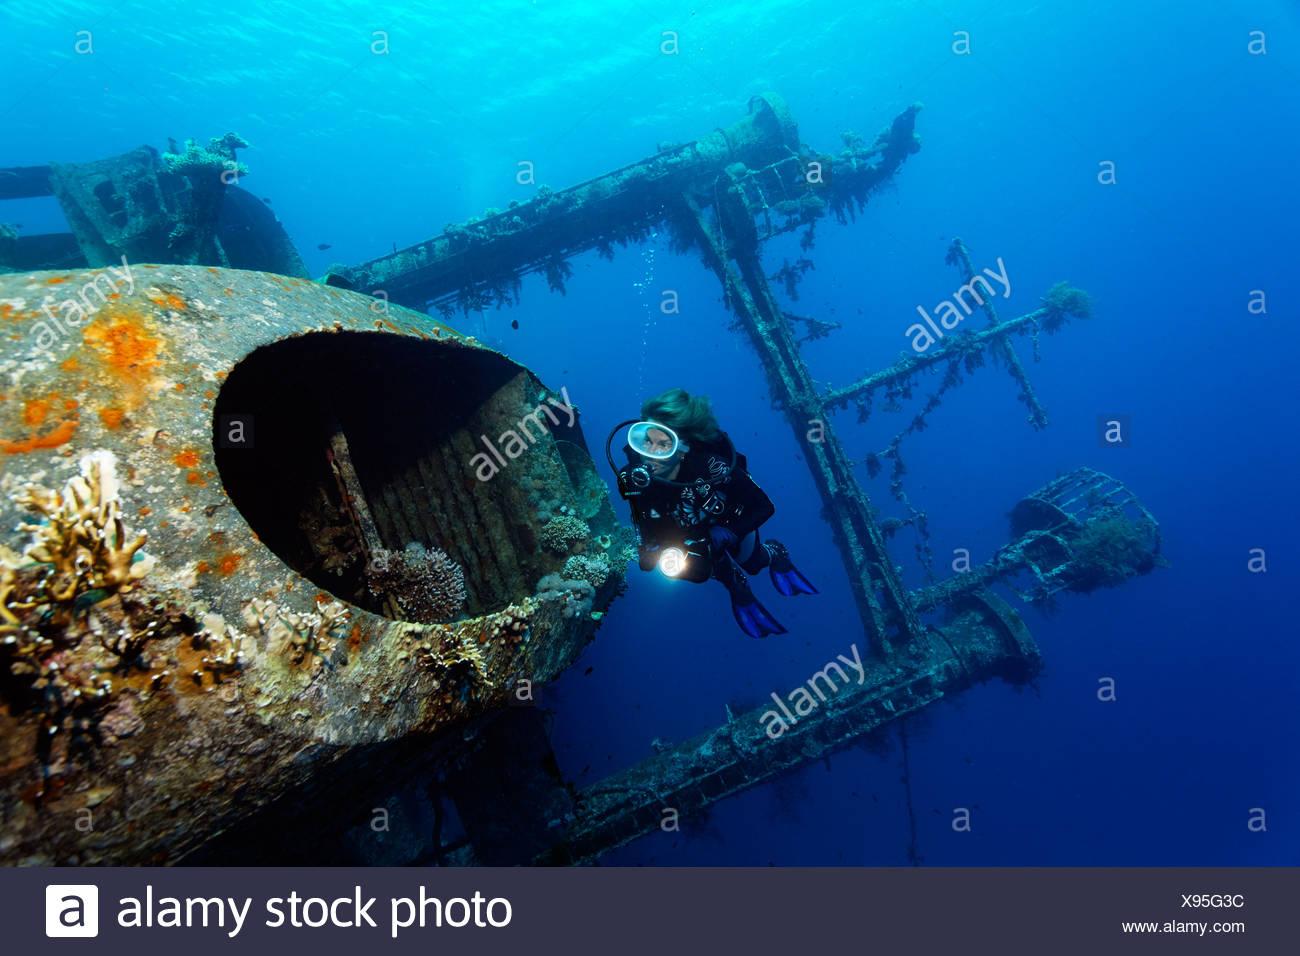 Diver at chimney, shipwreck, Cedar Pride, Red Sea, Hashemite Kingdom of Jordan, Western Asia - Stock Image